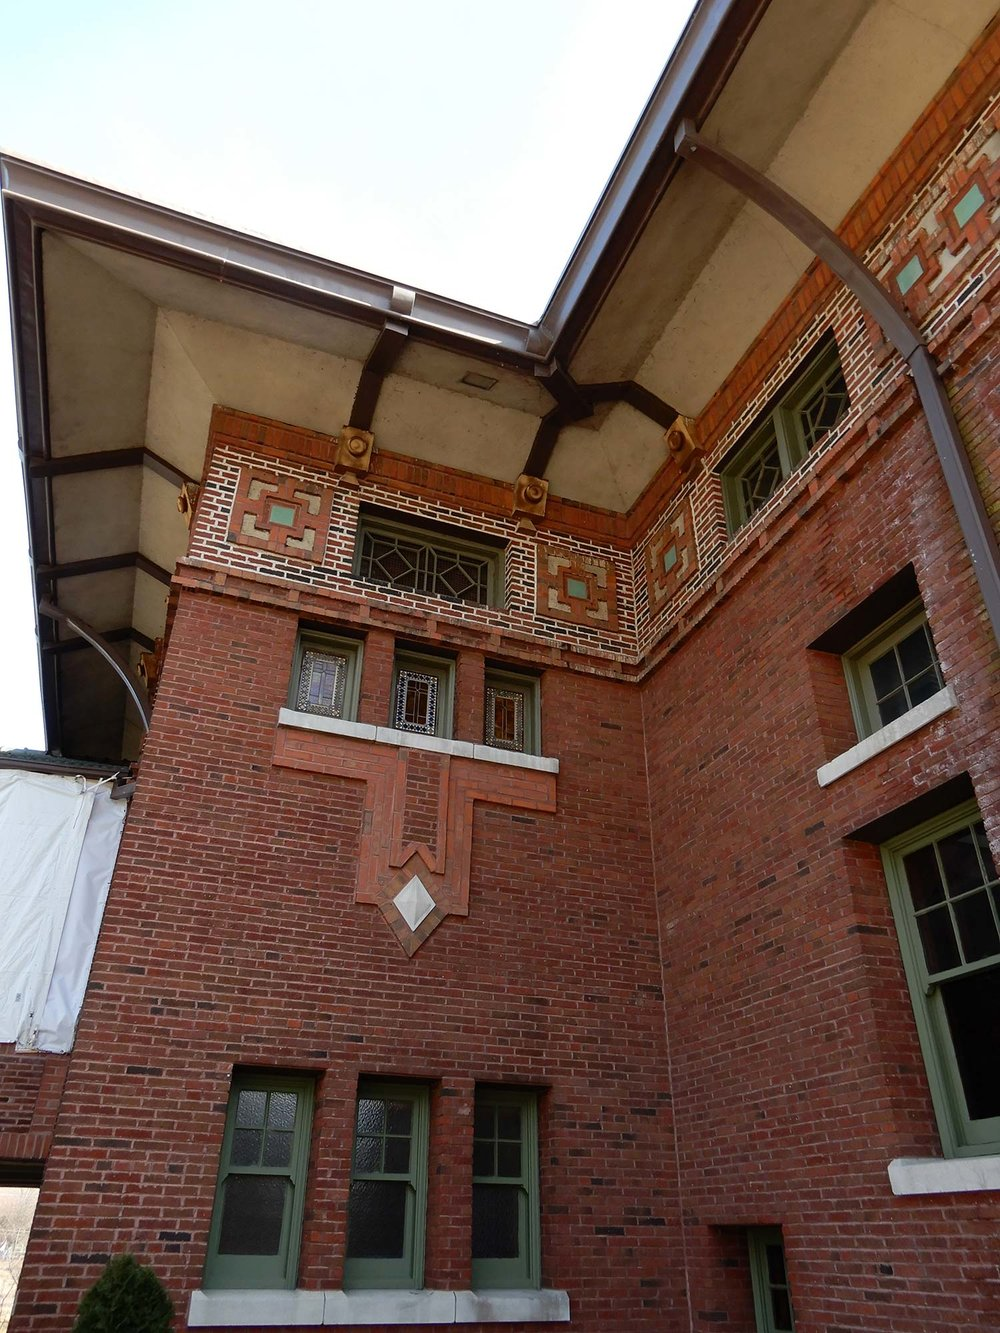 Café Brauer brick and terra cotta details. Photo by Julia Bachrach.